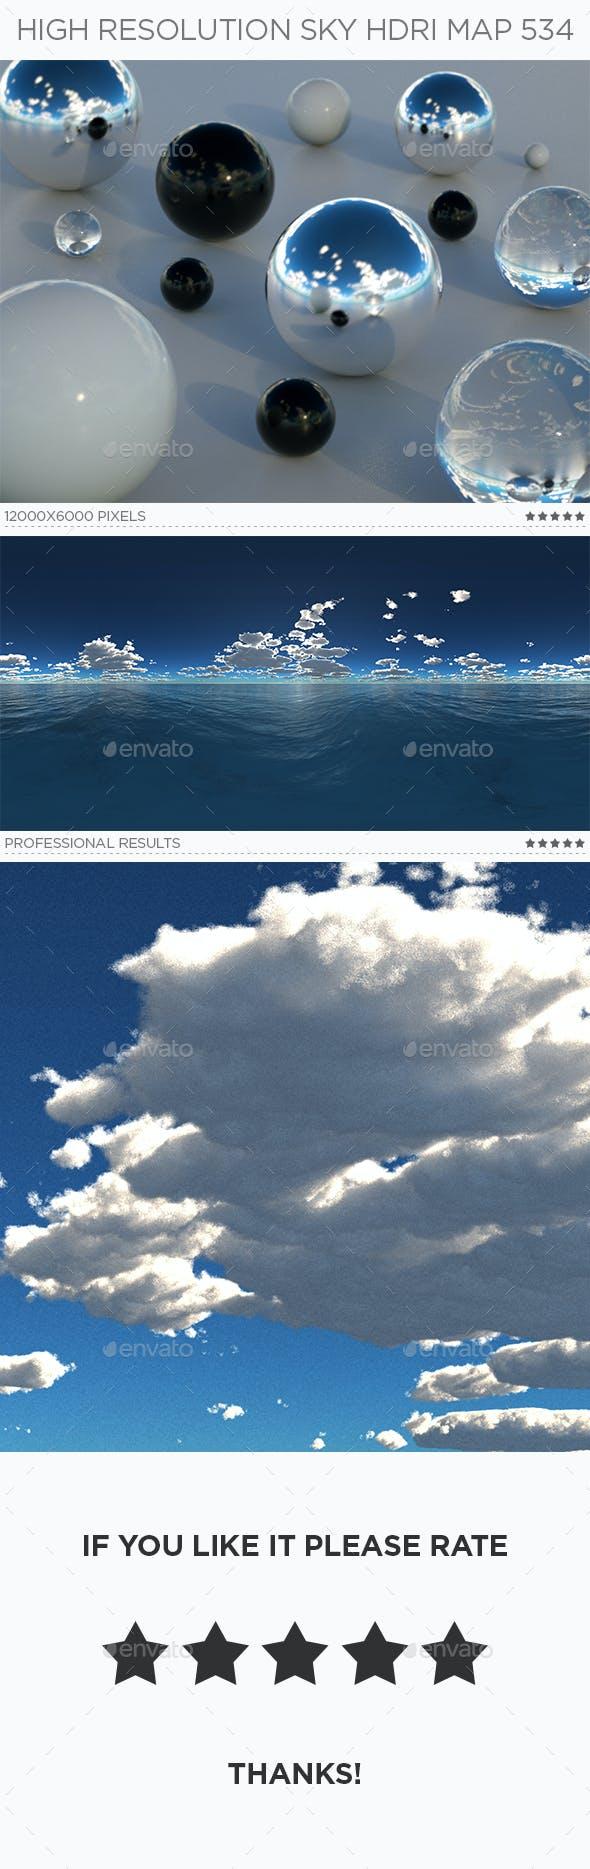 High Resolution Sky HDRi Map 534 - 3DOcean Item for Sale